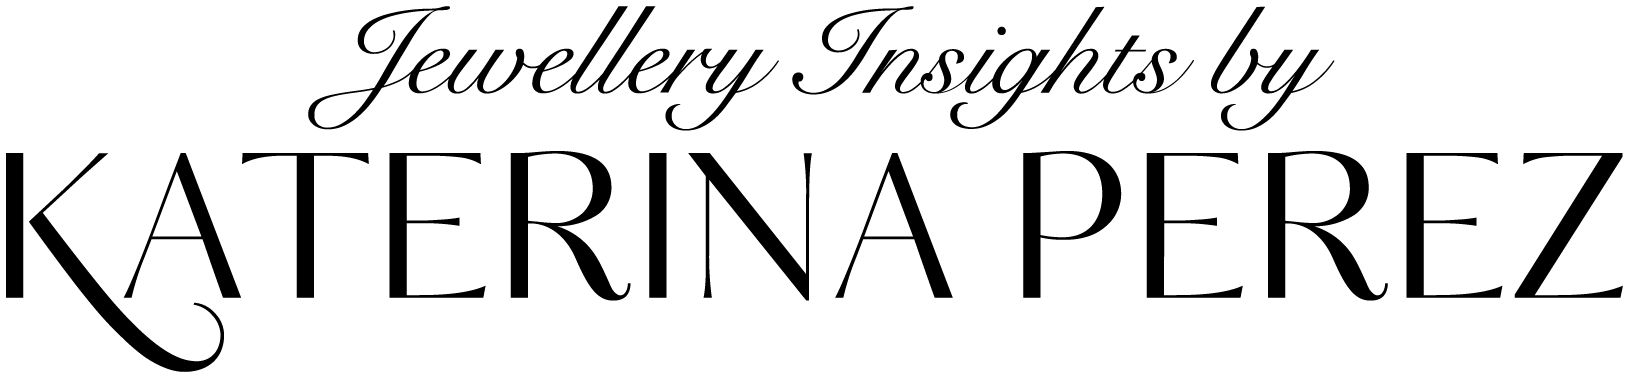 Logo Jewellery Insights by Katerina Perez